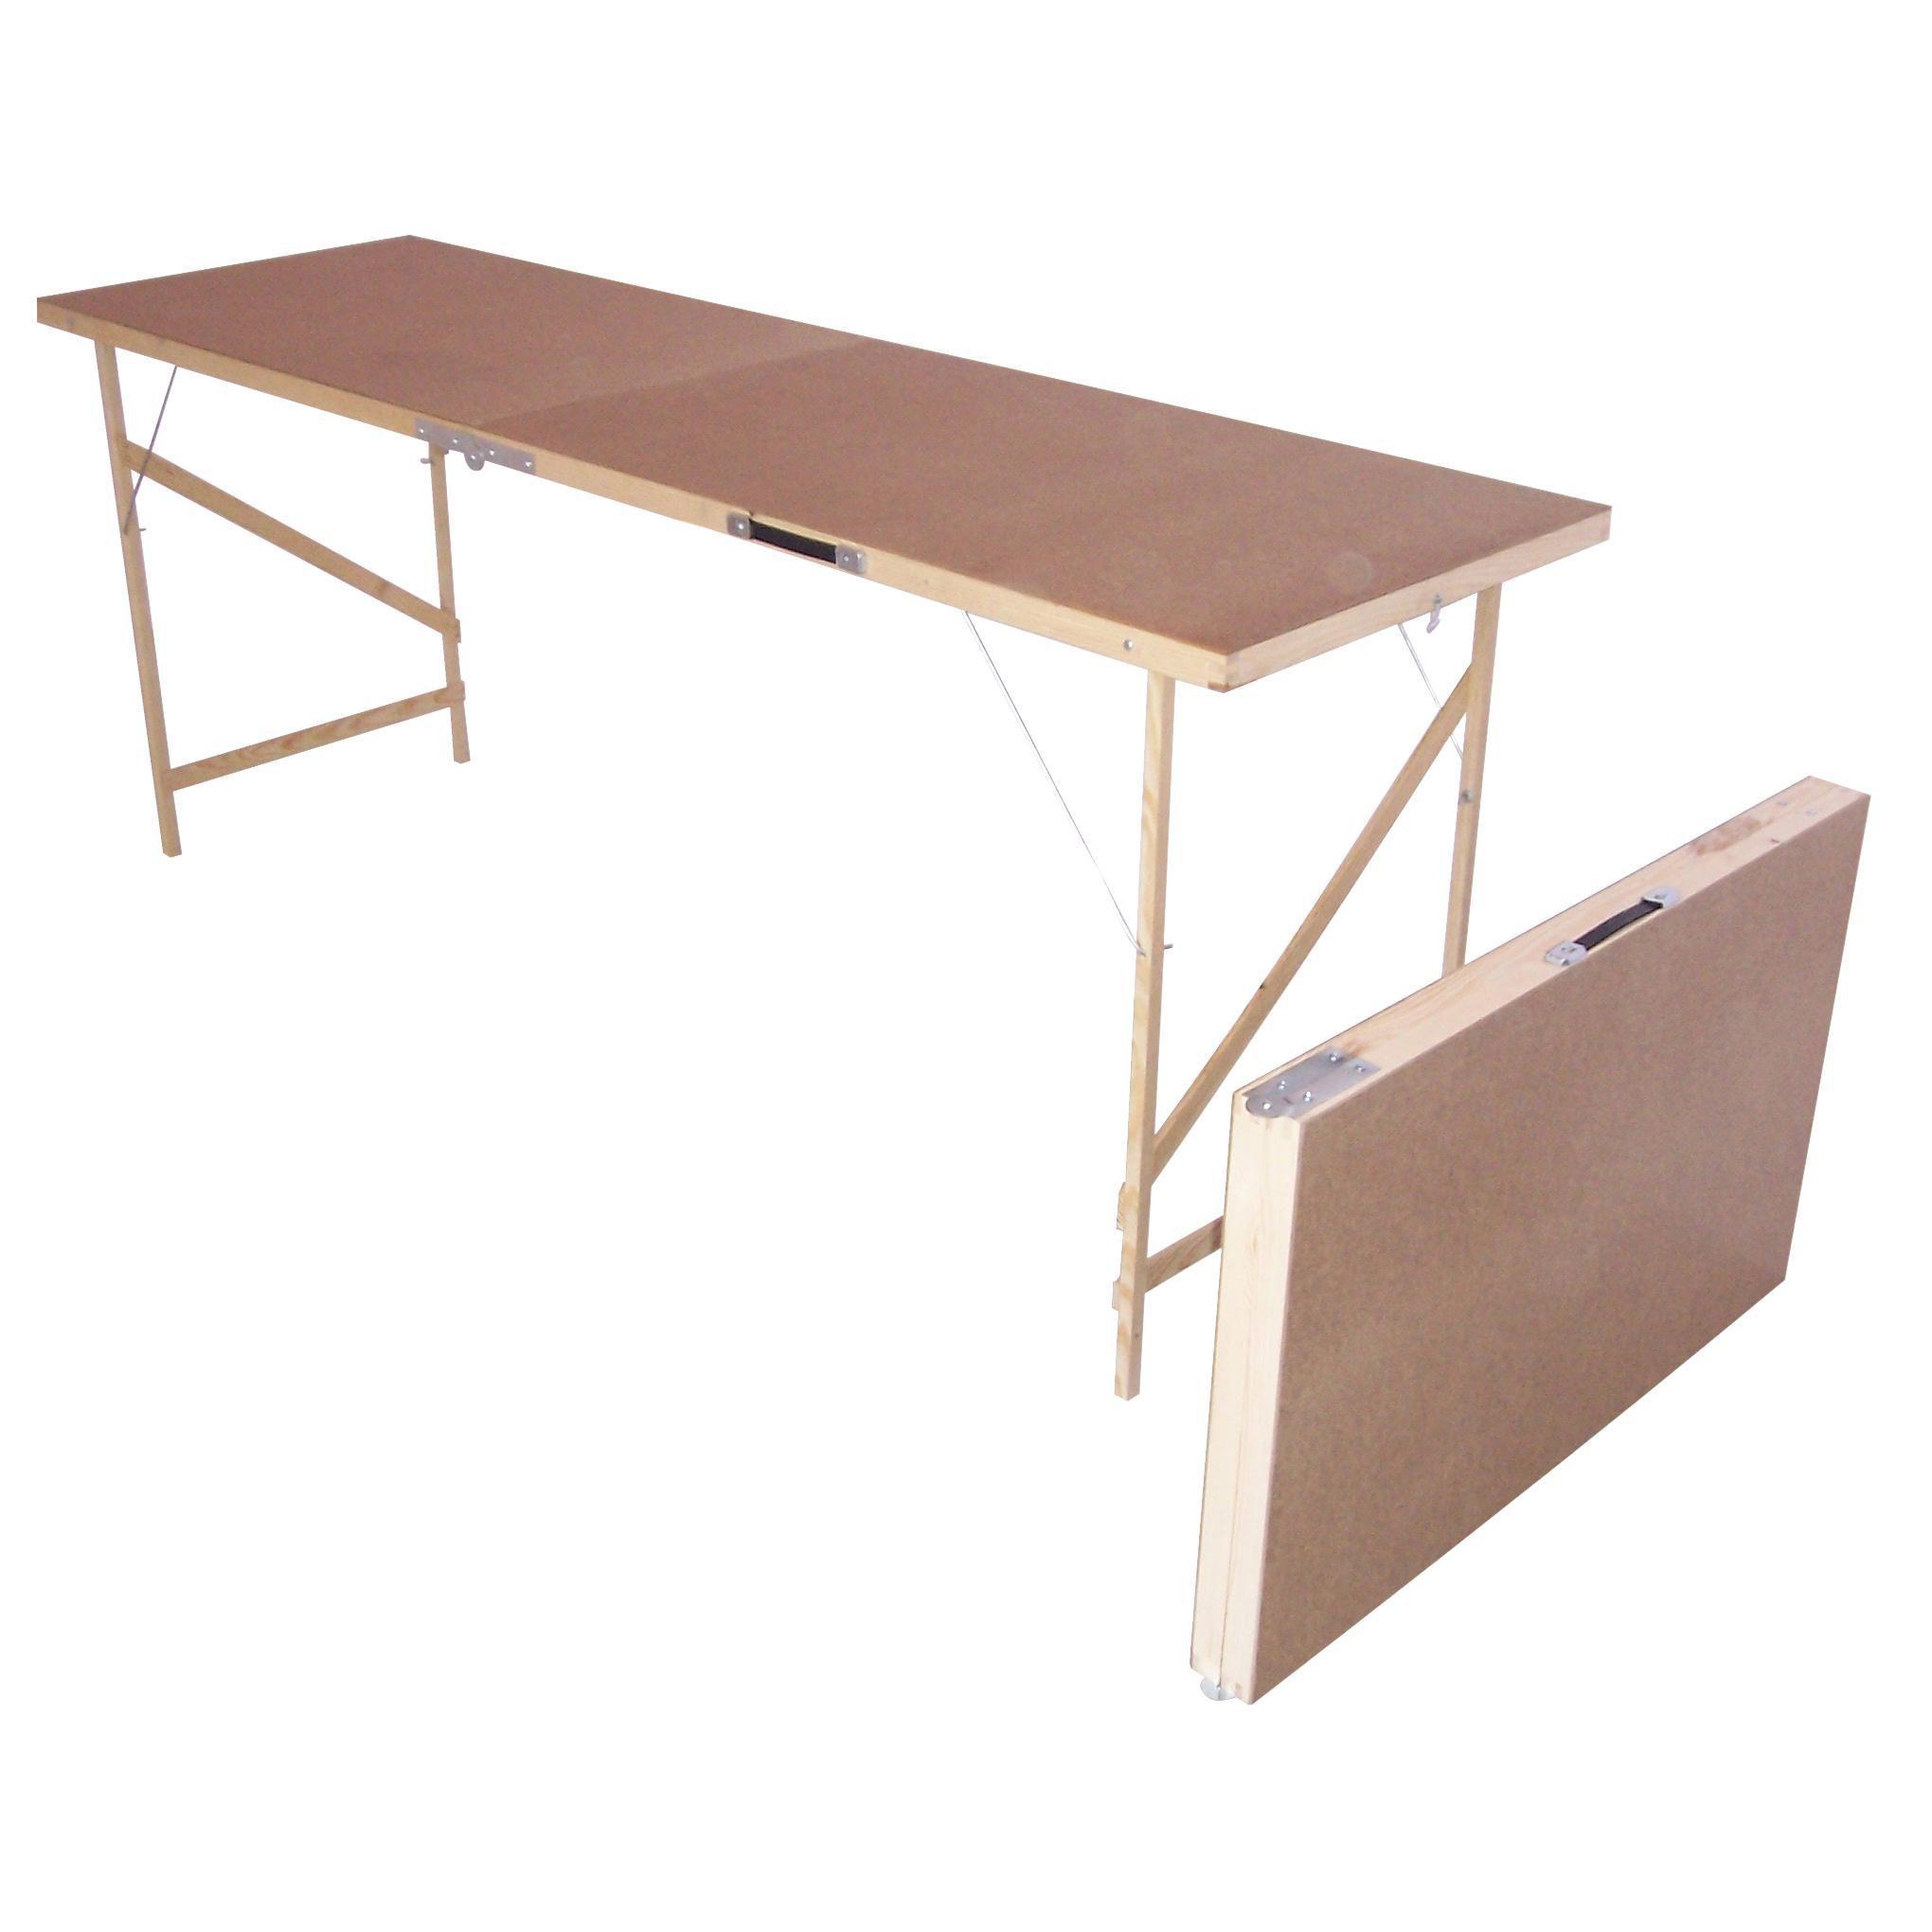 B Q Foldable Paste Table H 740mm W 560mm L 1780mm Departments Diy At B Q